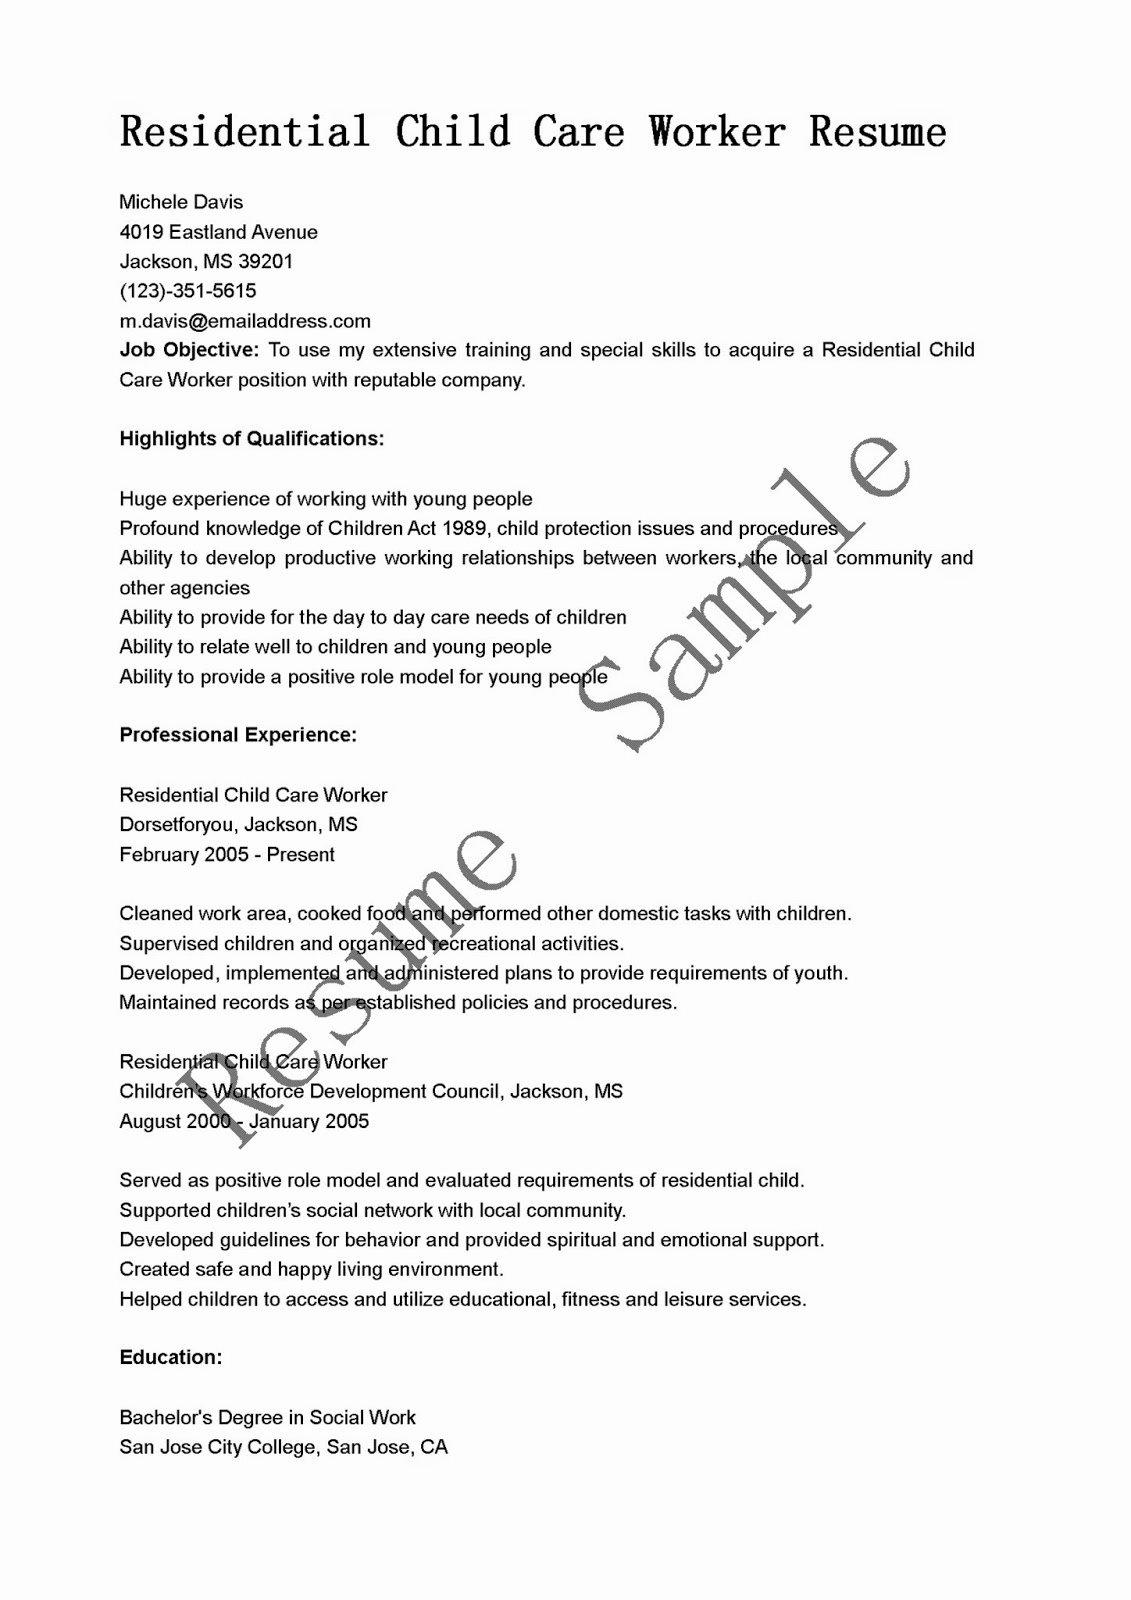 Child Care Resume Template Beautiful Resume Samples Residential Child Care Worker Resume Sample